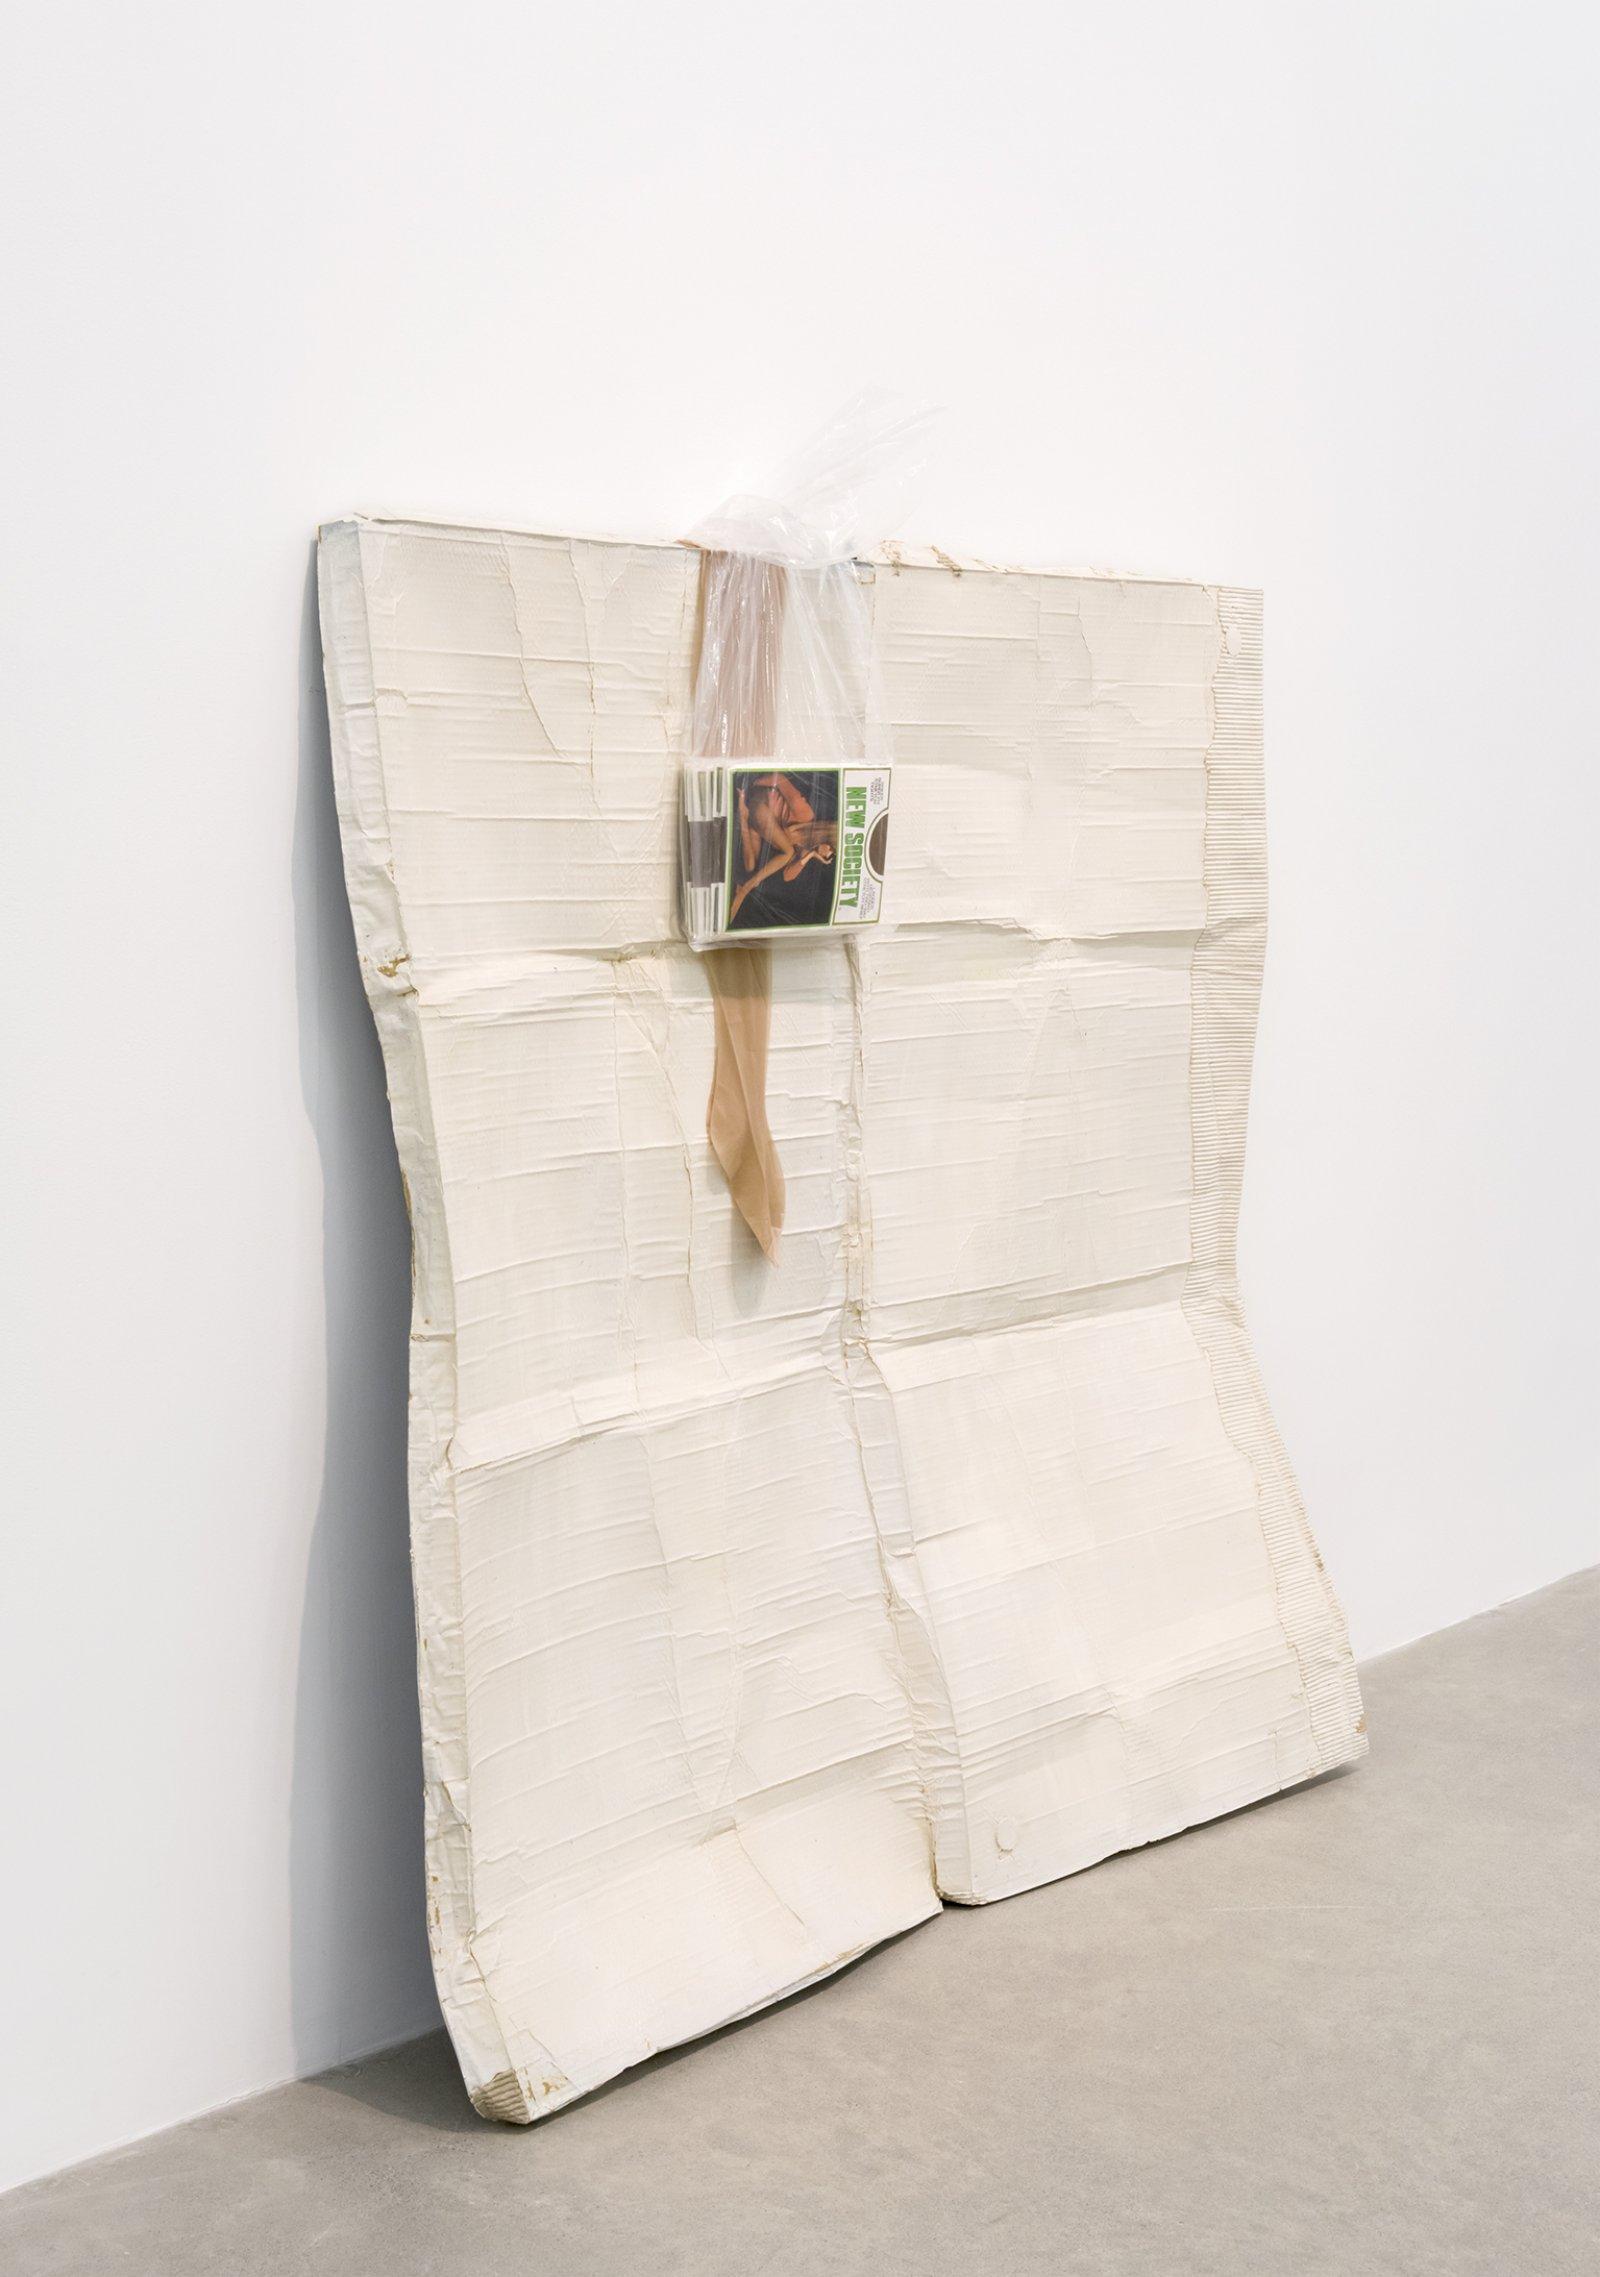 Liz Magor, New Society, 2016, polymerized gypsum, plastic bag, nylon stockings, 66 x 61 x 12 in. (168 x 155 x 30 cm) by Liz Magor